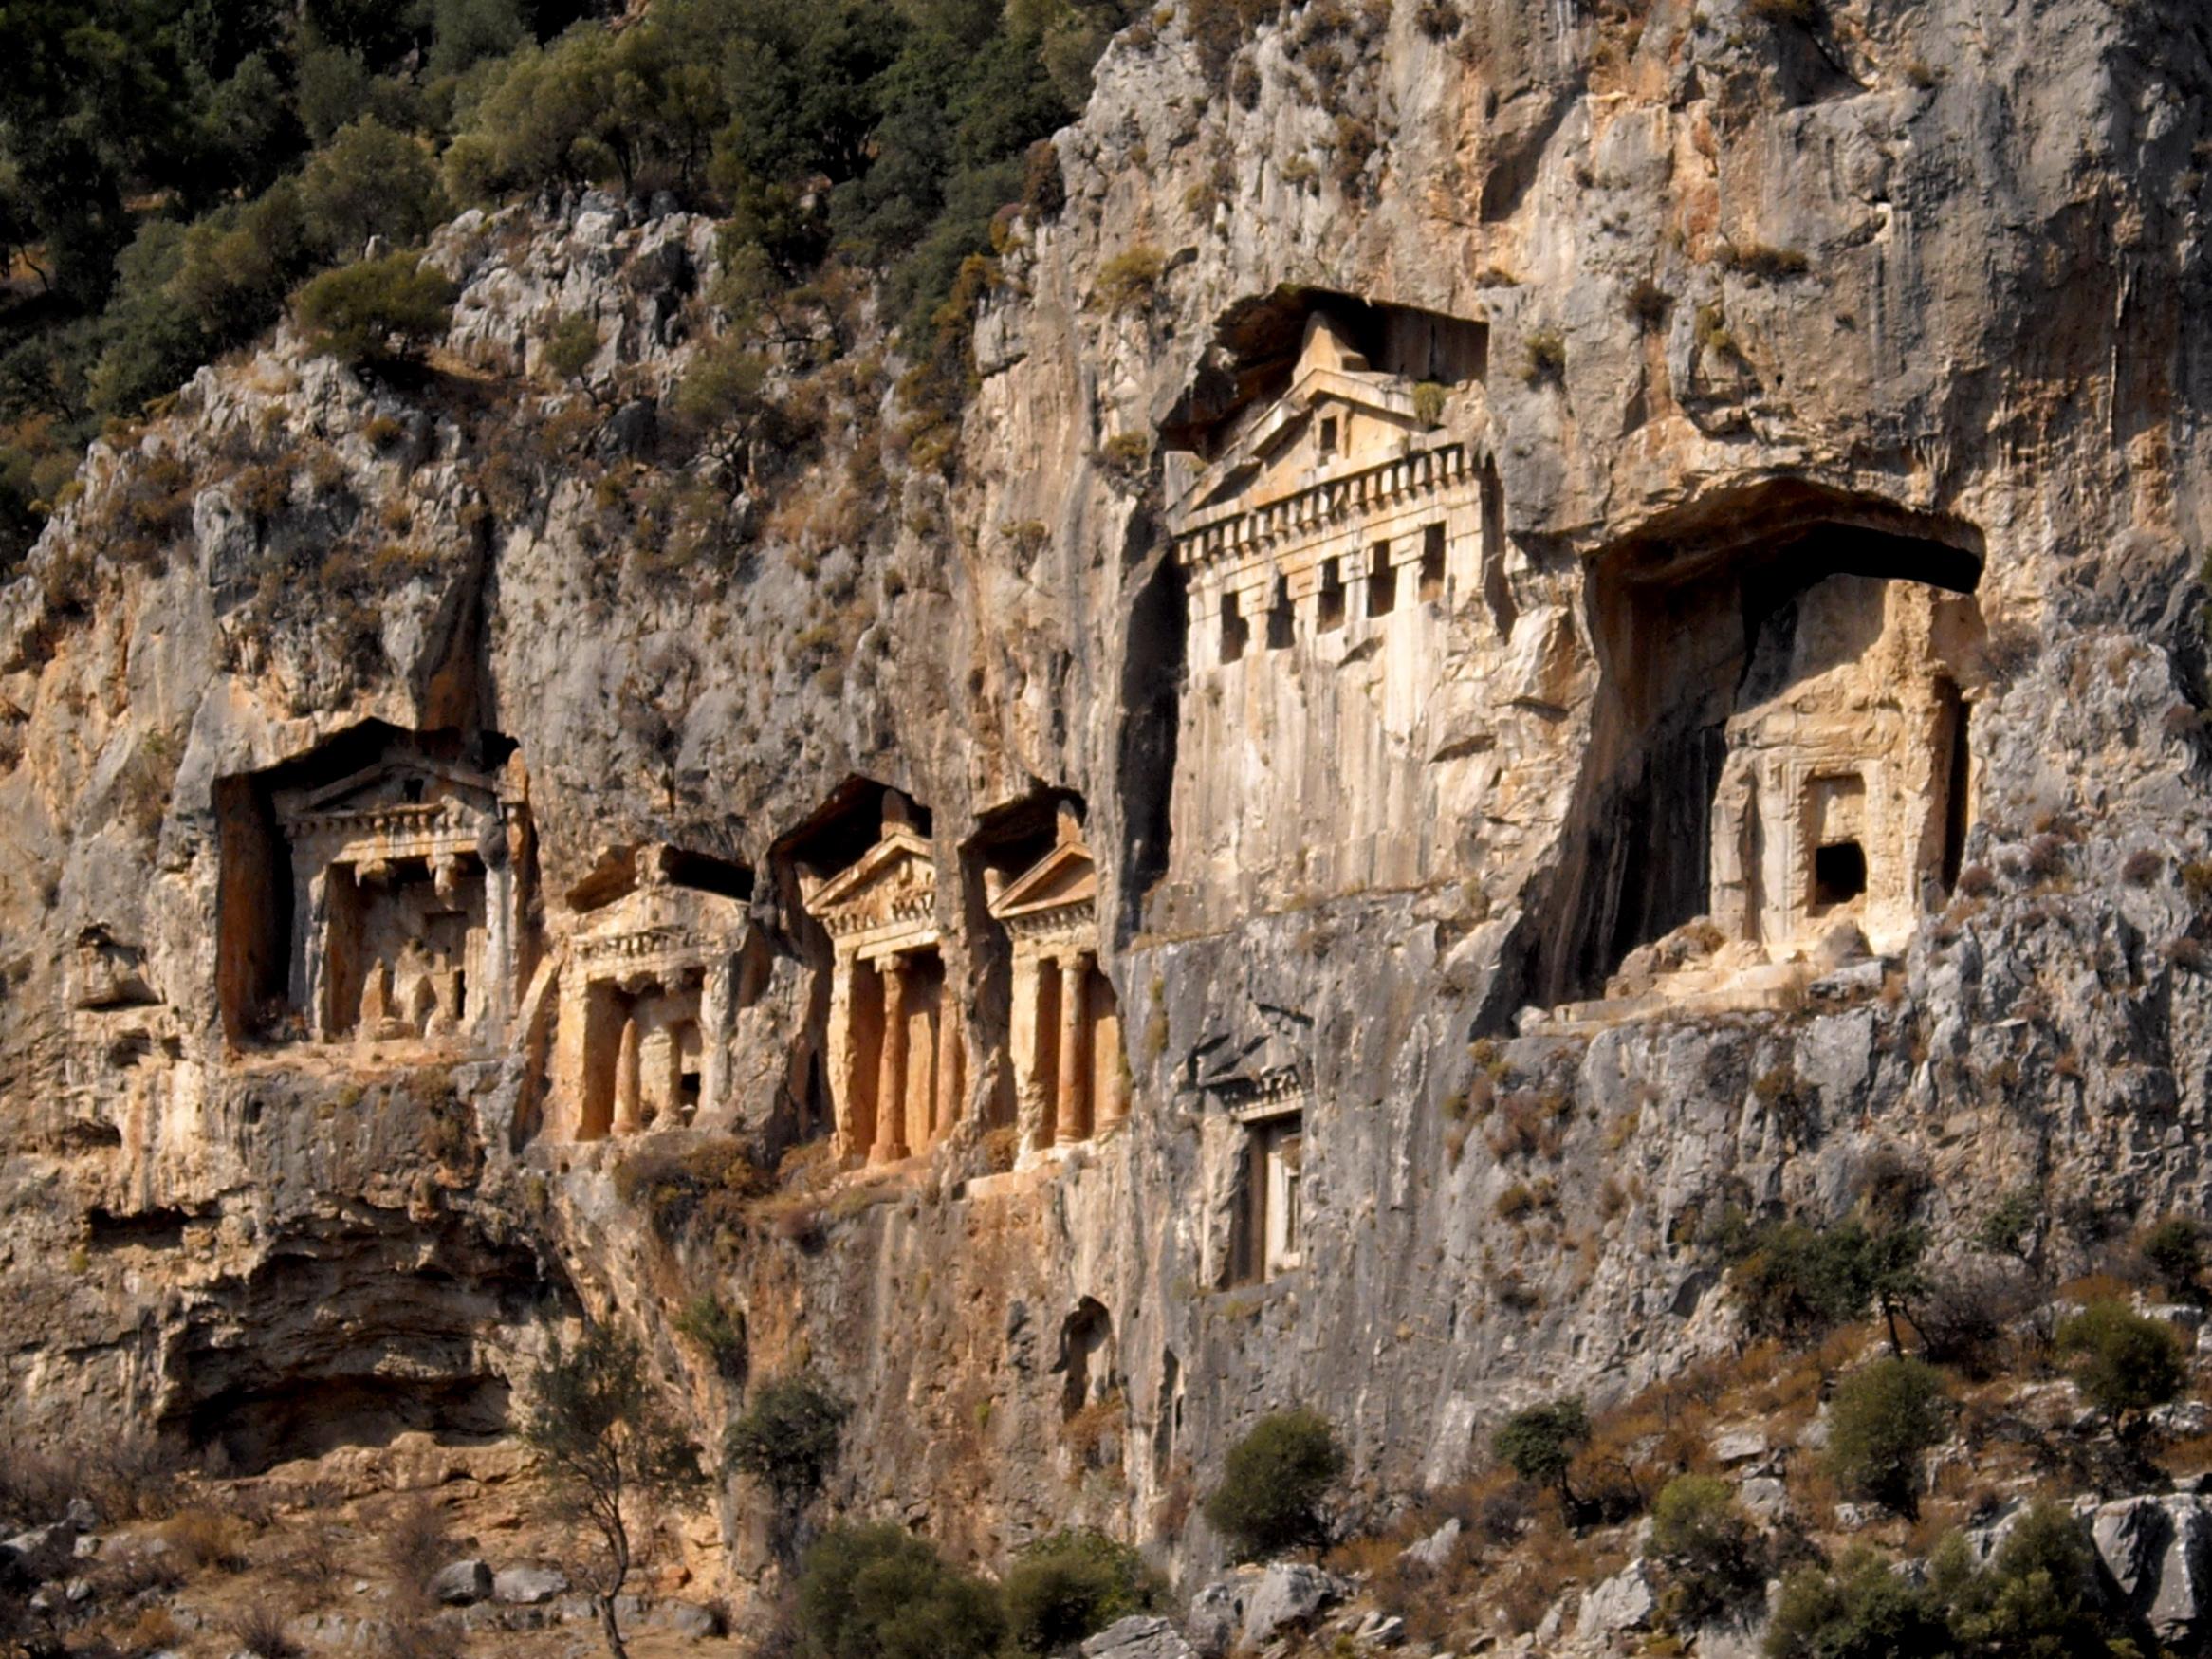 File:Lycian rock-cut tombs in Hellenistic style - Dalyan ...